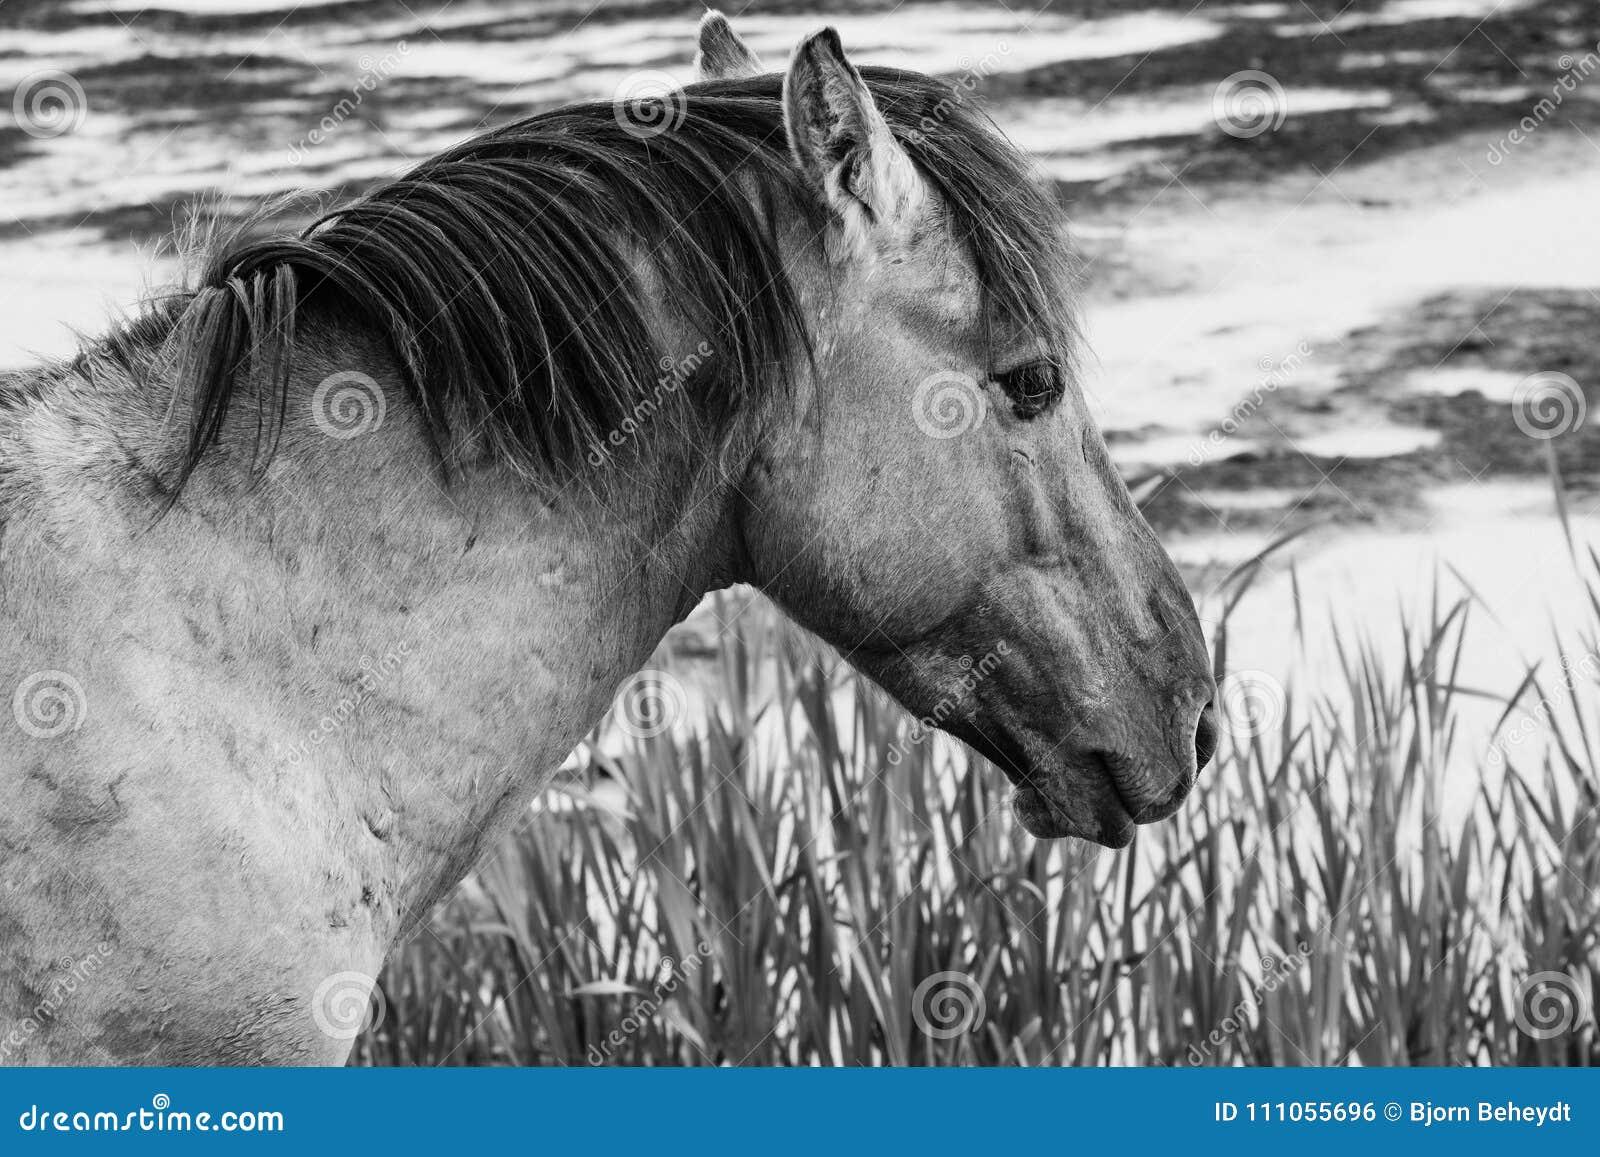 European Wild Horses In Black And White Stock Photo Image Of Black Animal 111055696